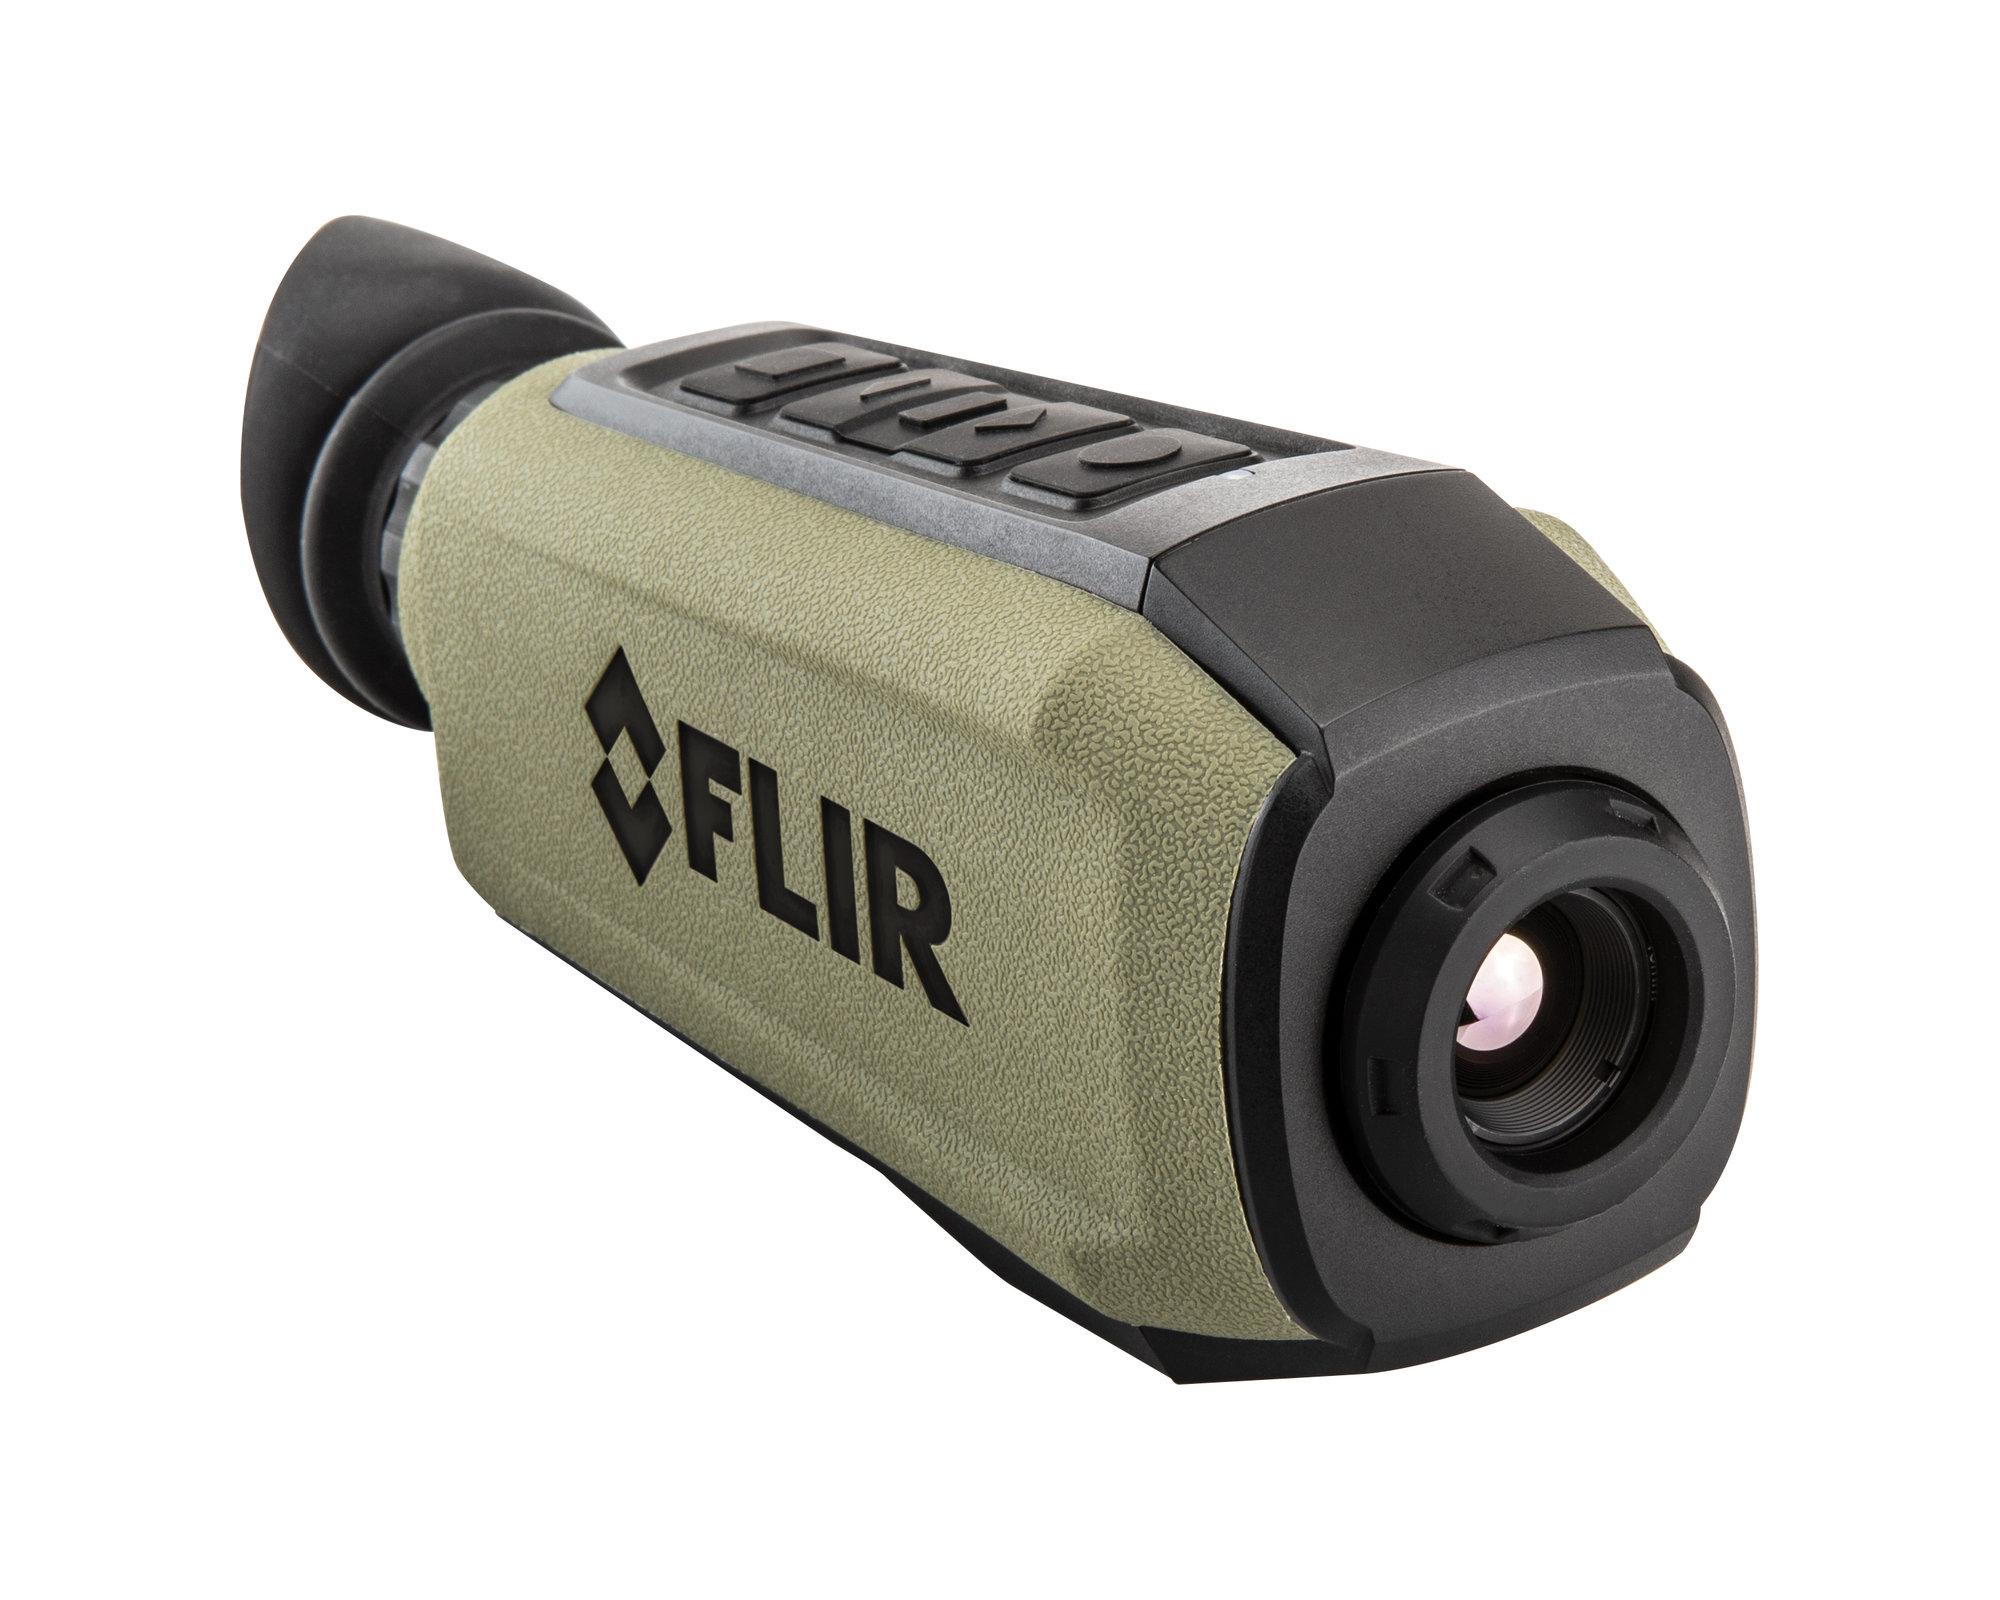 Termovízia FLIR SCION OTM 366 640x512 - 25 mm